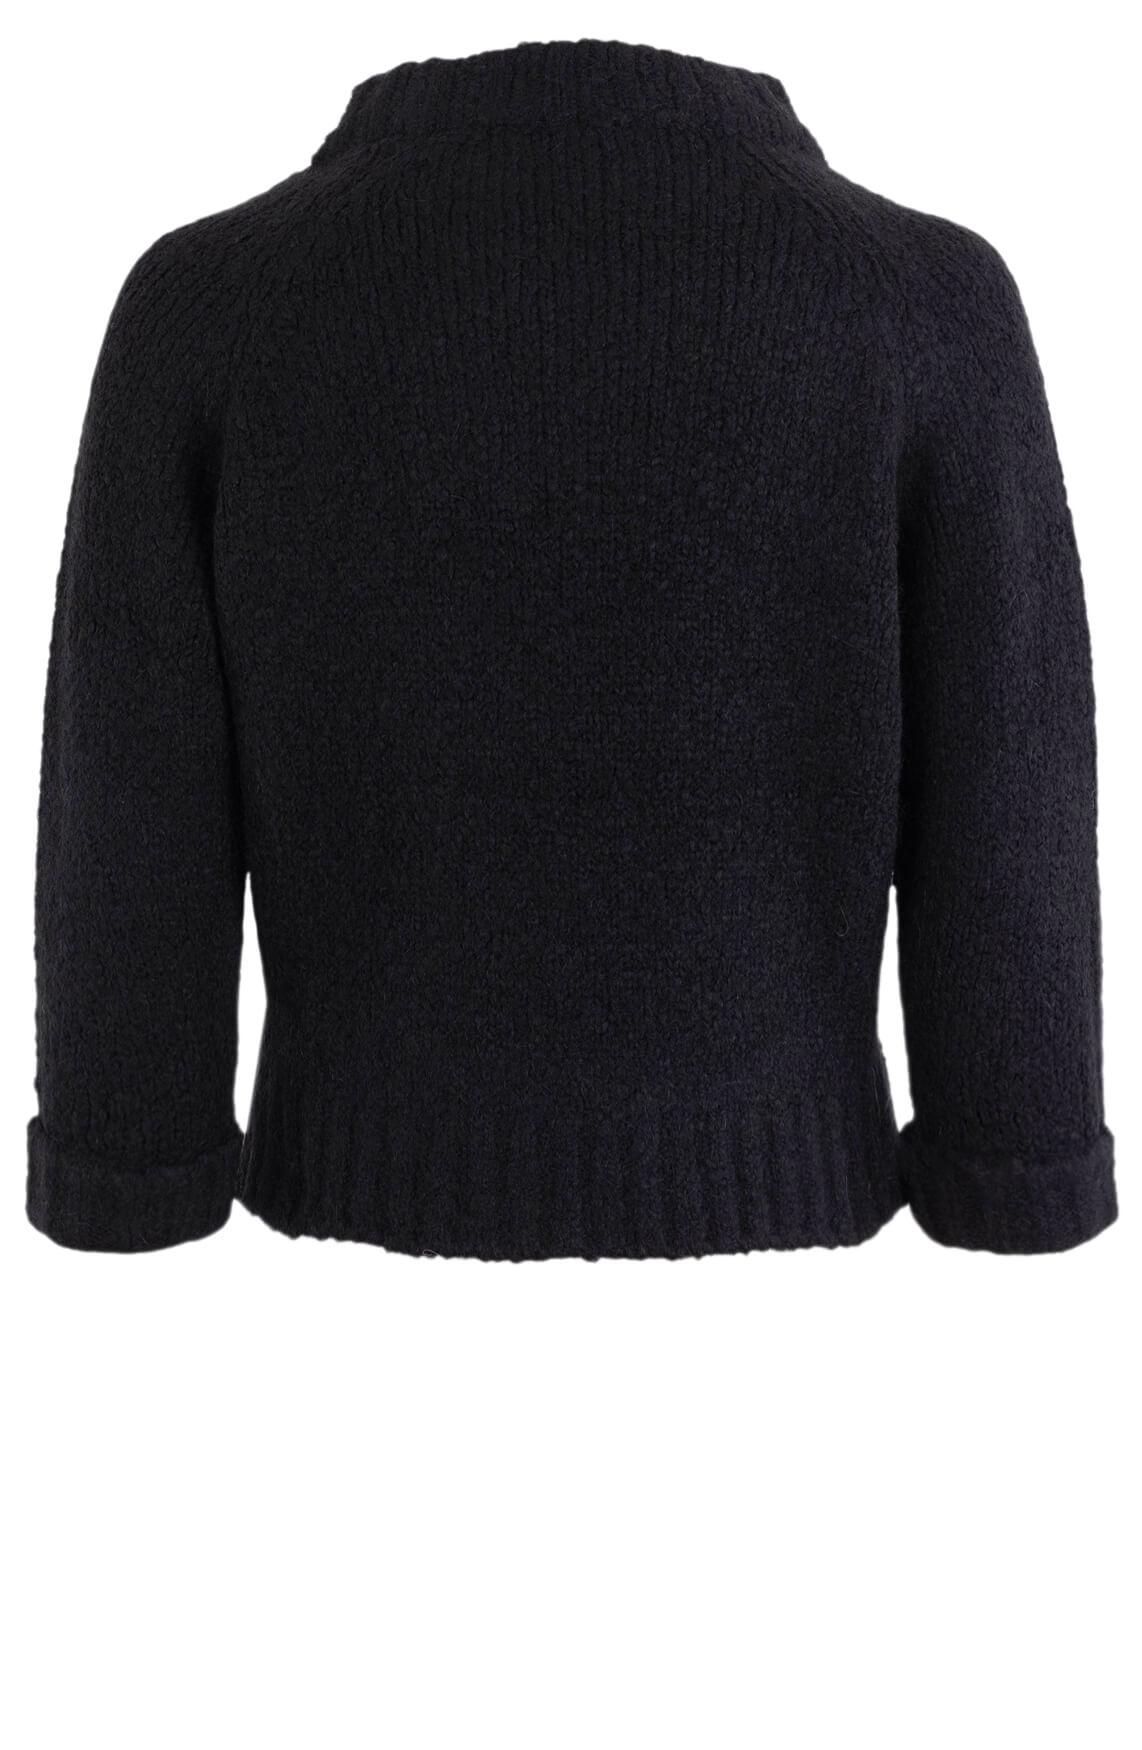 Penn & Ink Dames Cropped trui Zwart